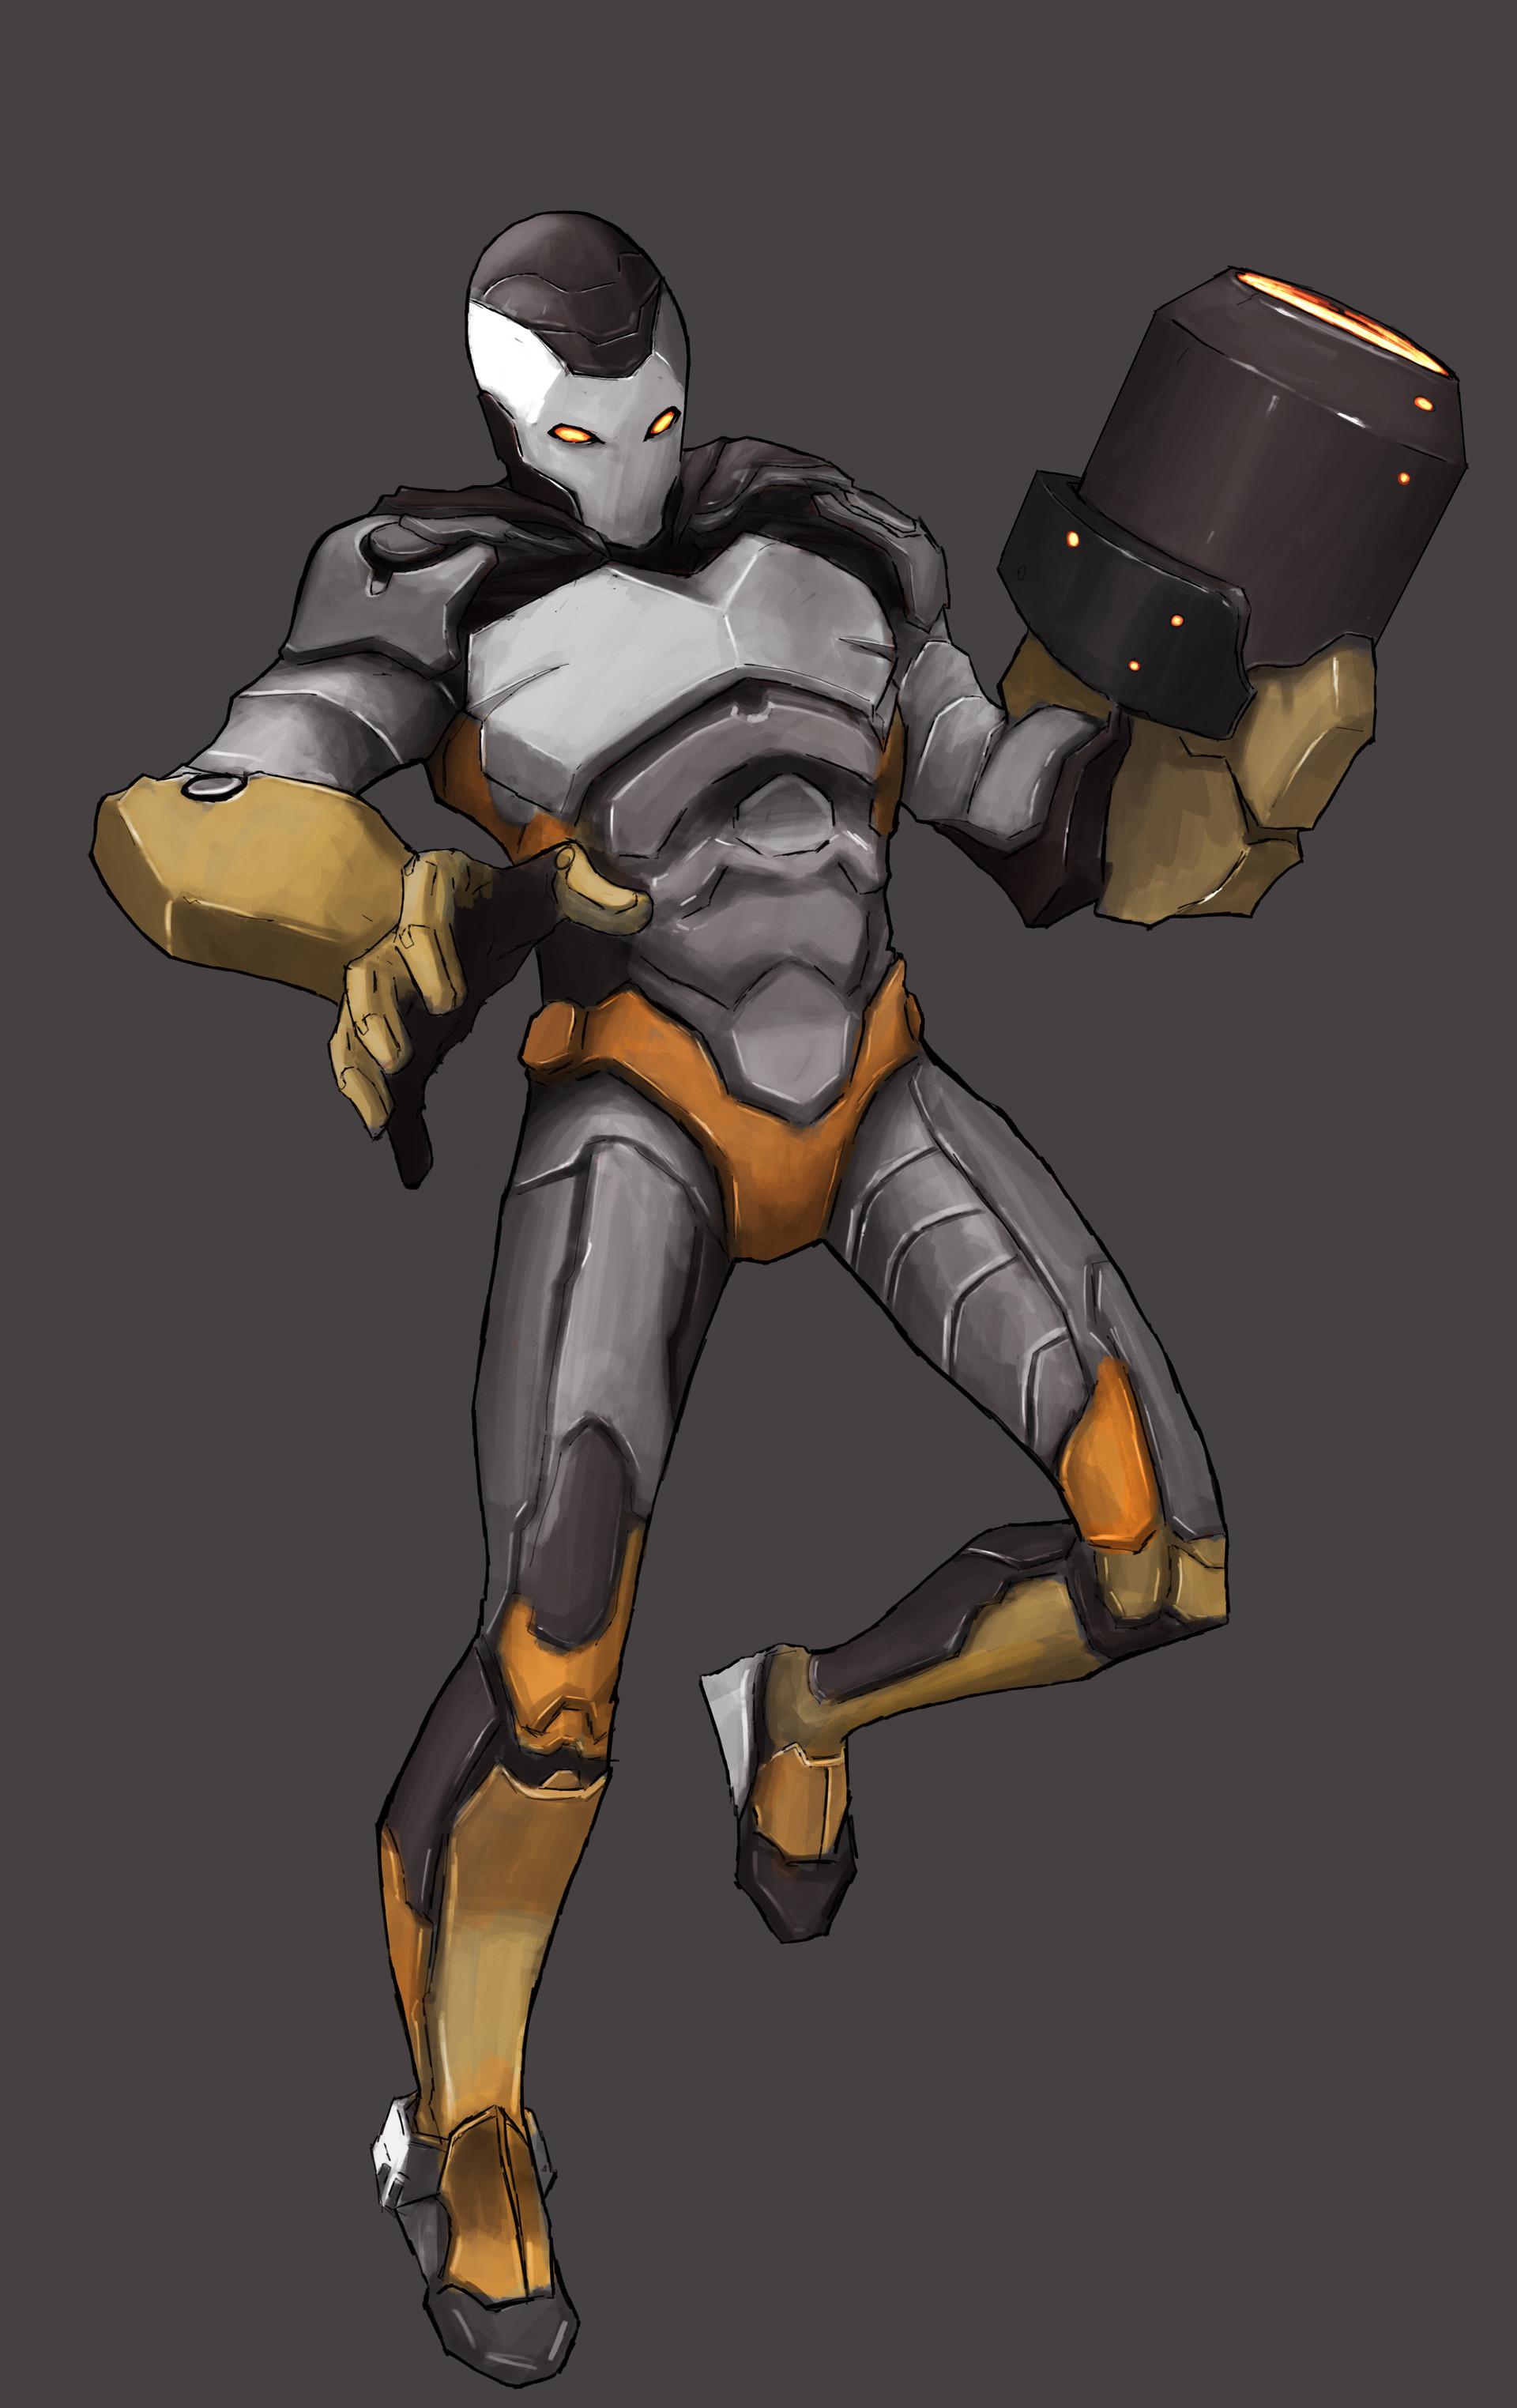 Gbenle maverick cyborg 9